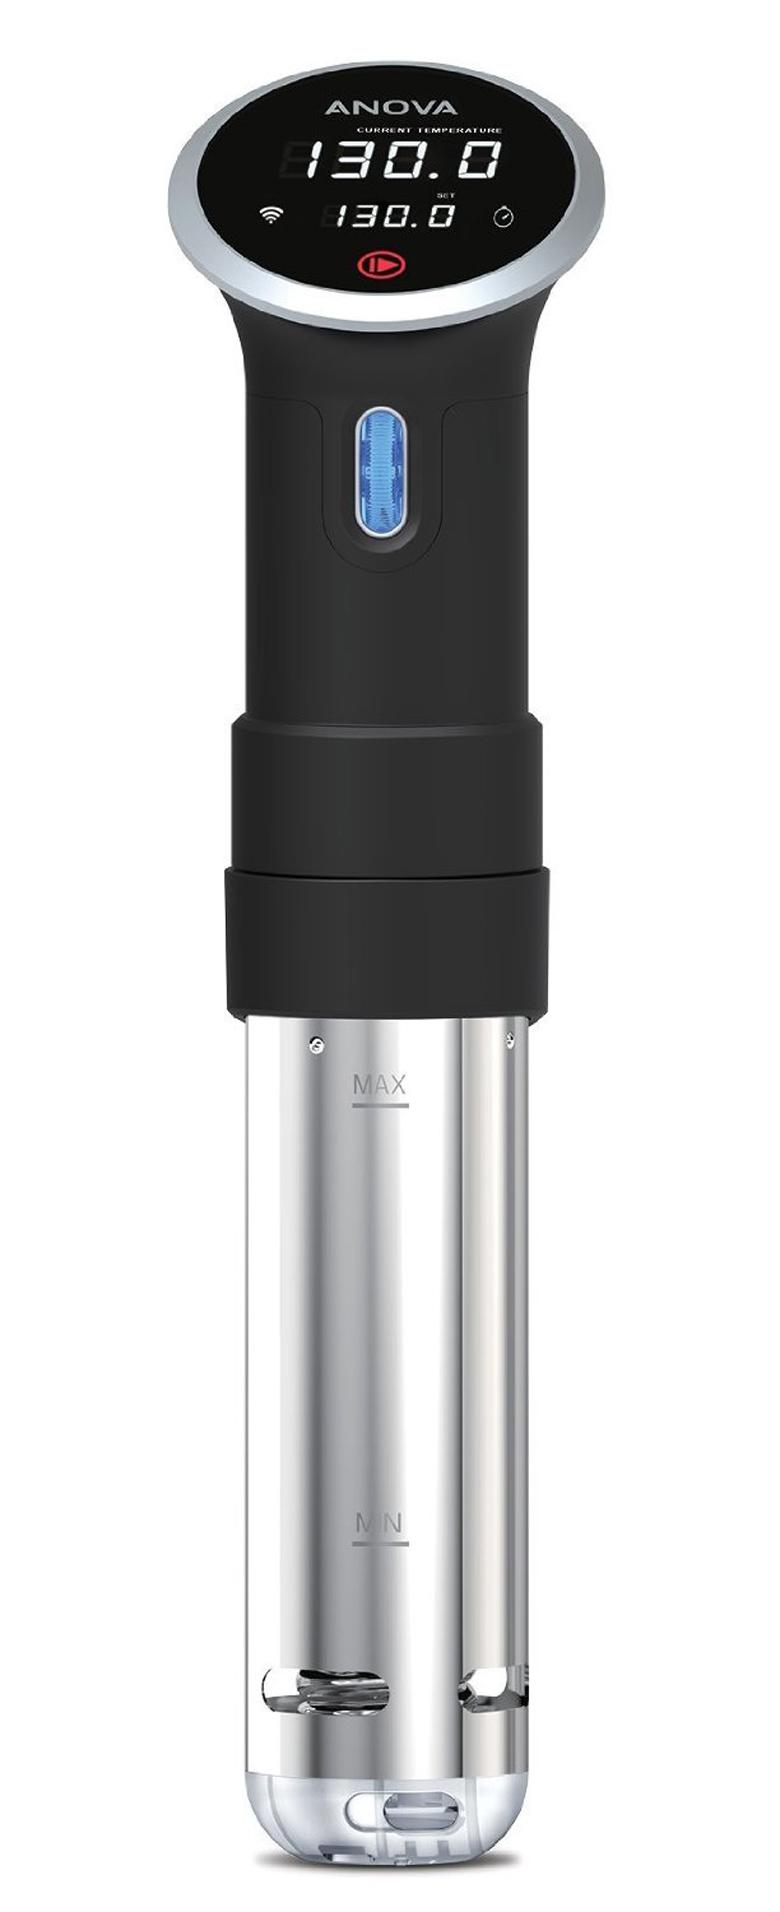 Anova PCW-120US-K1 Wifi Precision Cooker